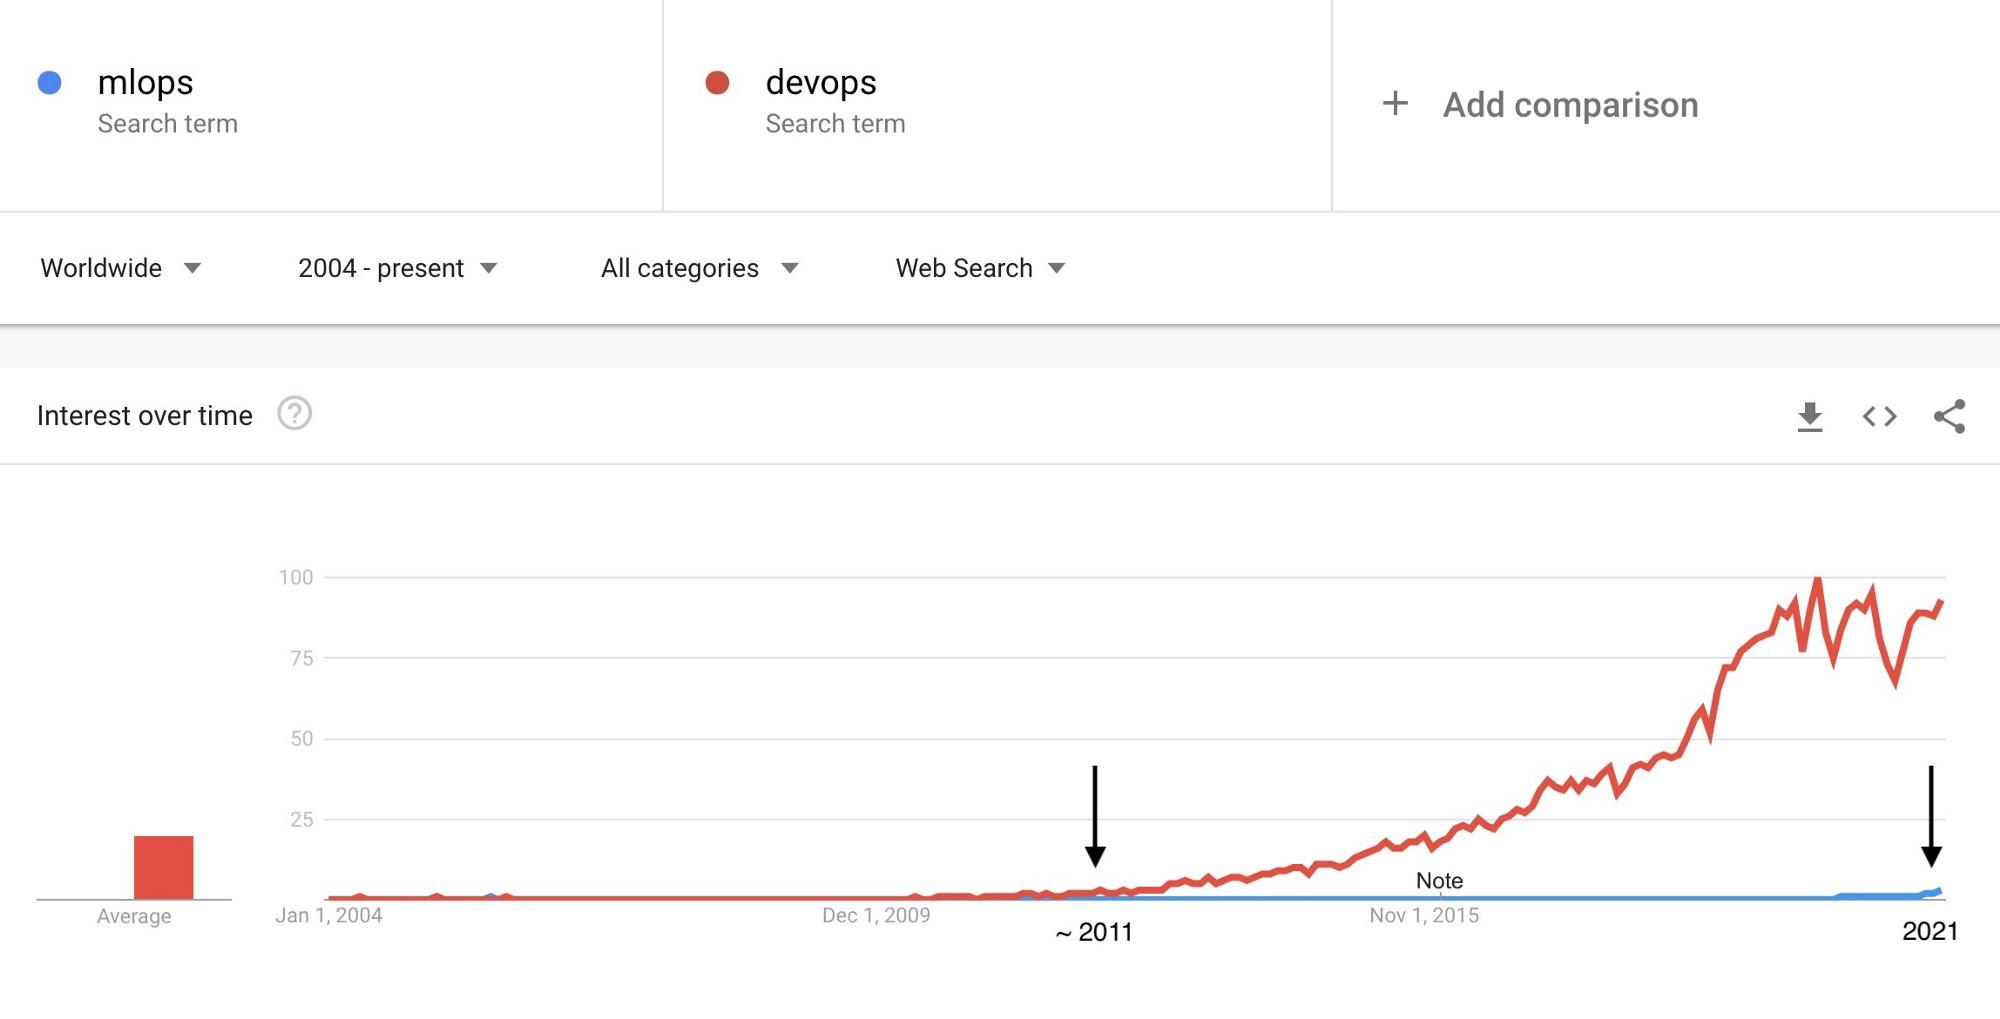 MLOps is about 10 years behind DevOps